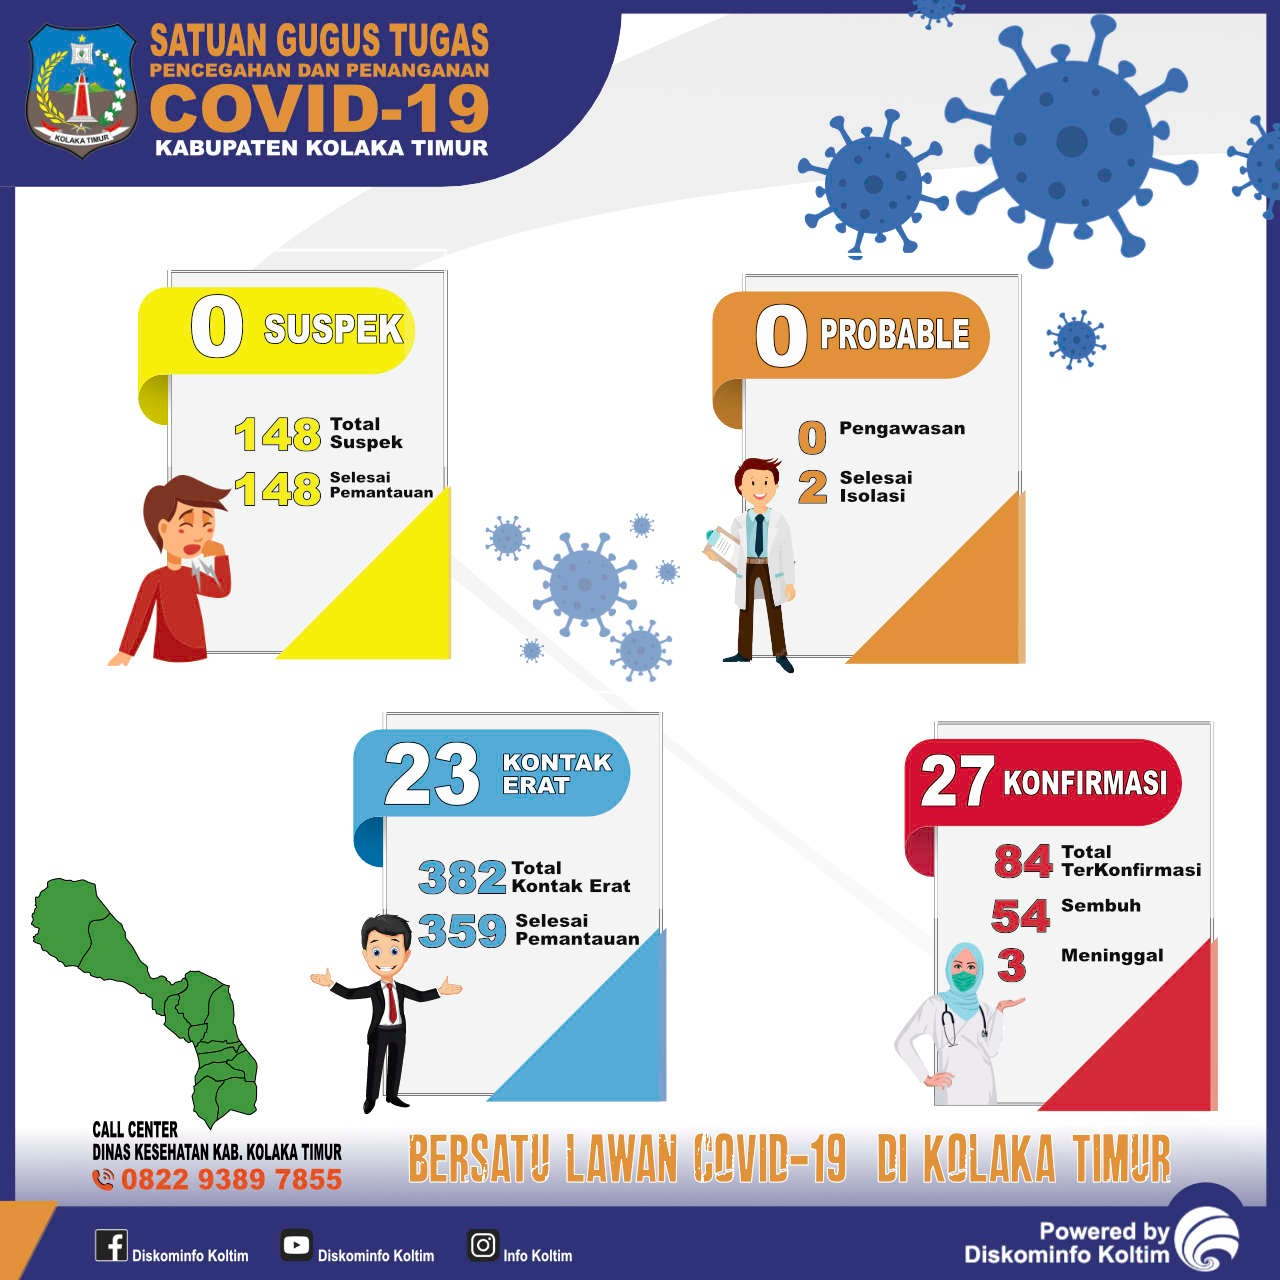 DATA COVID-19 KAB. KOLAKA TIMUR TANGGAL 23 DESEMBER 2020